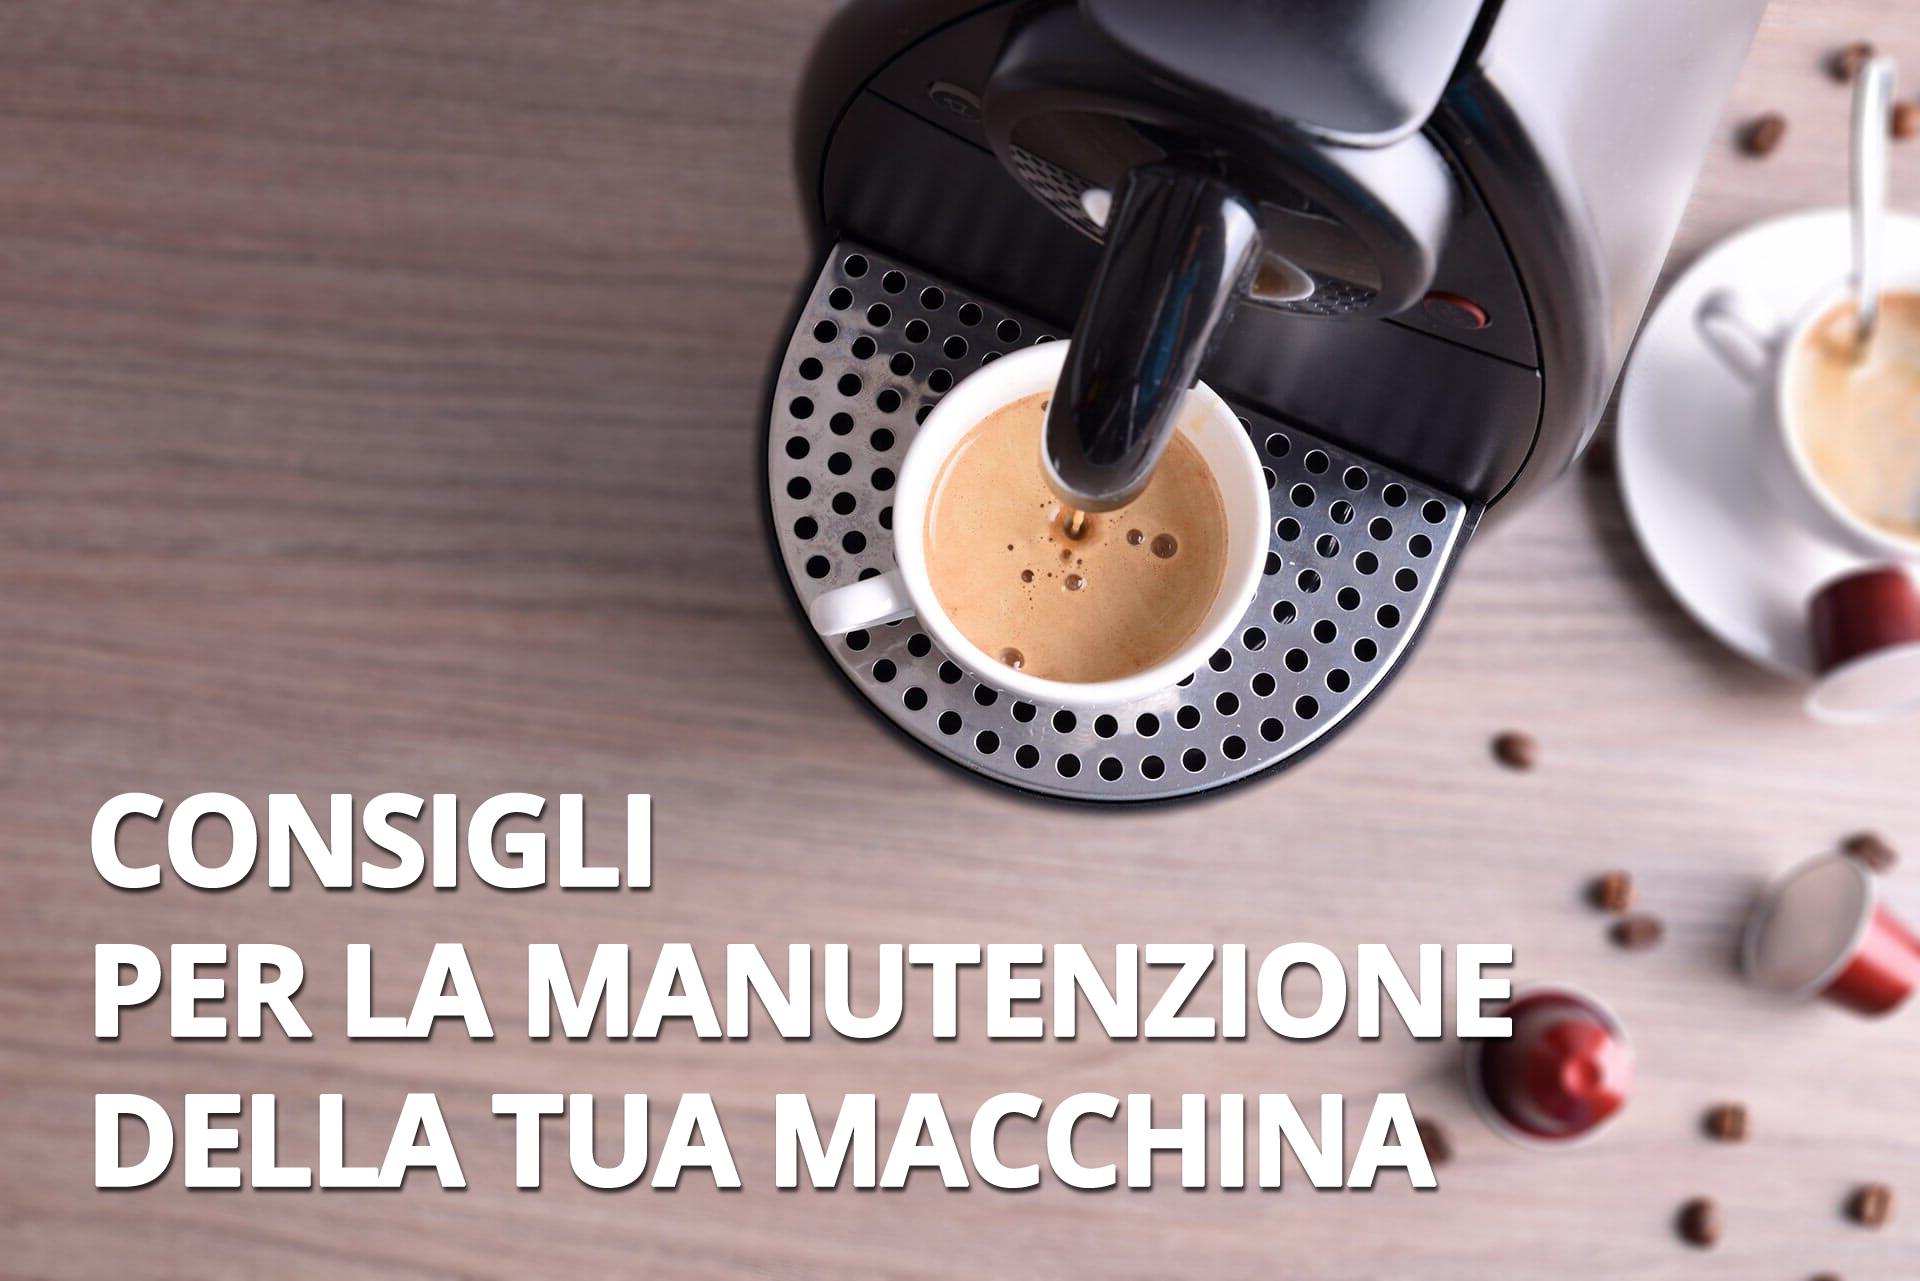 Consigli per macchiana da caffe